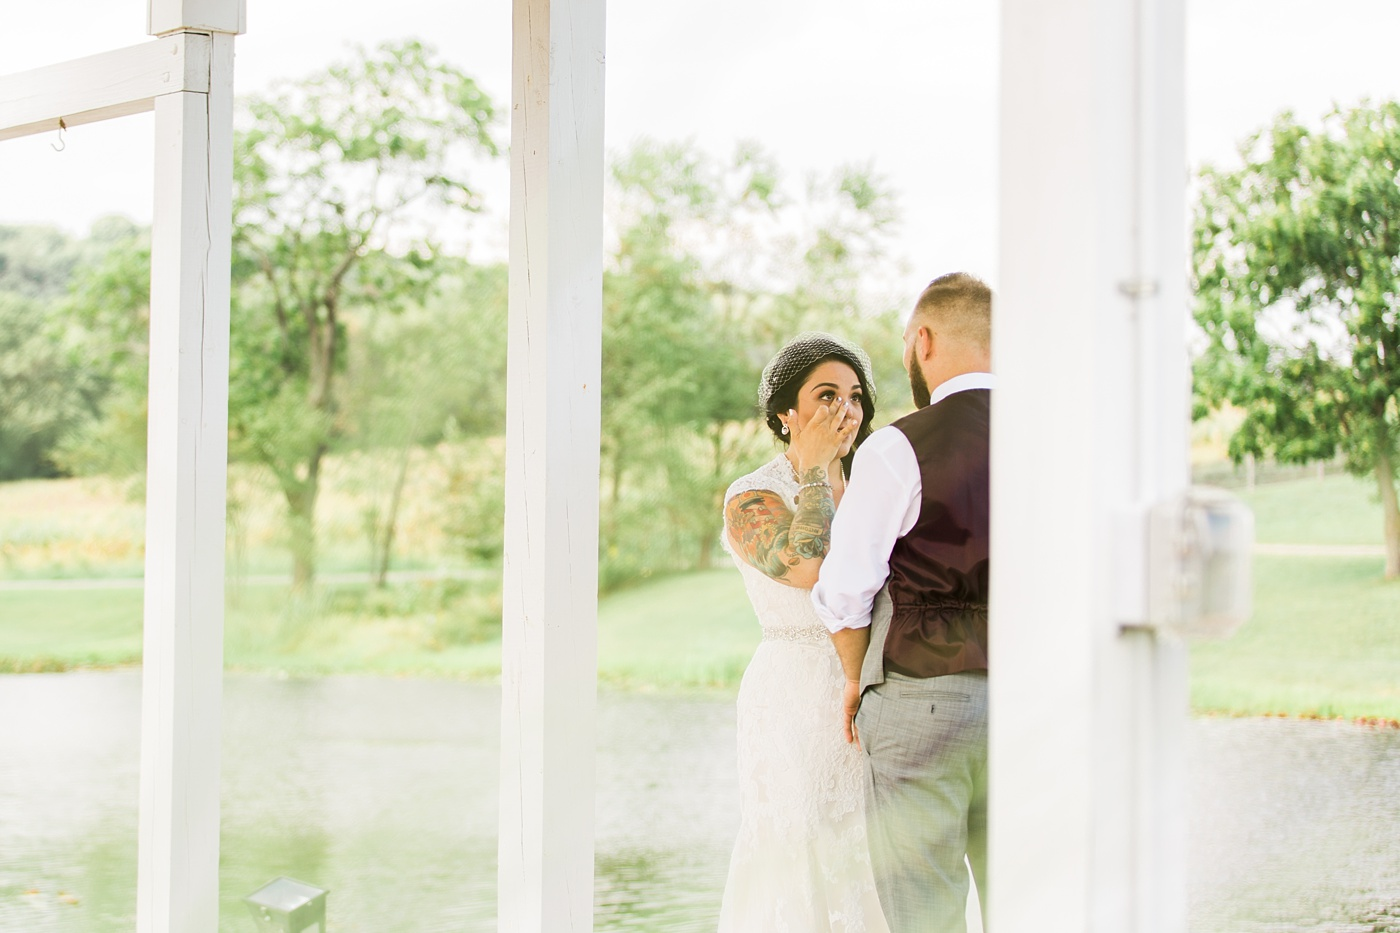 lingrow-farm-wedding-photo-75